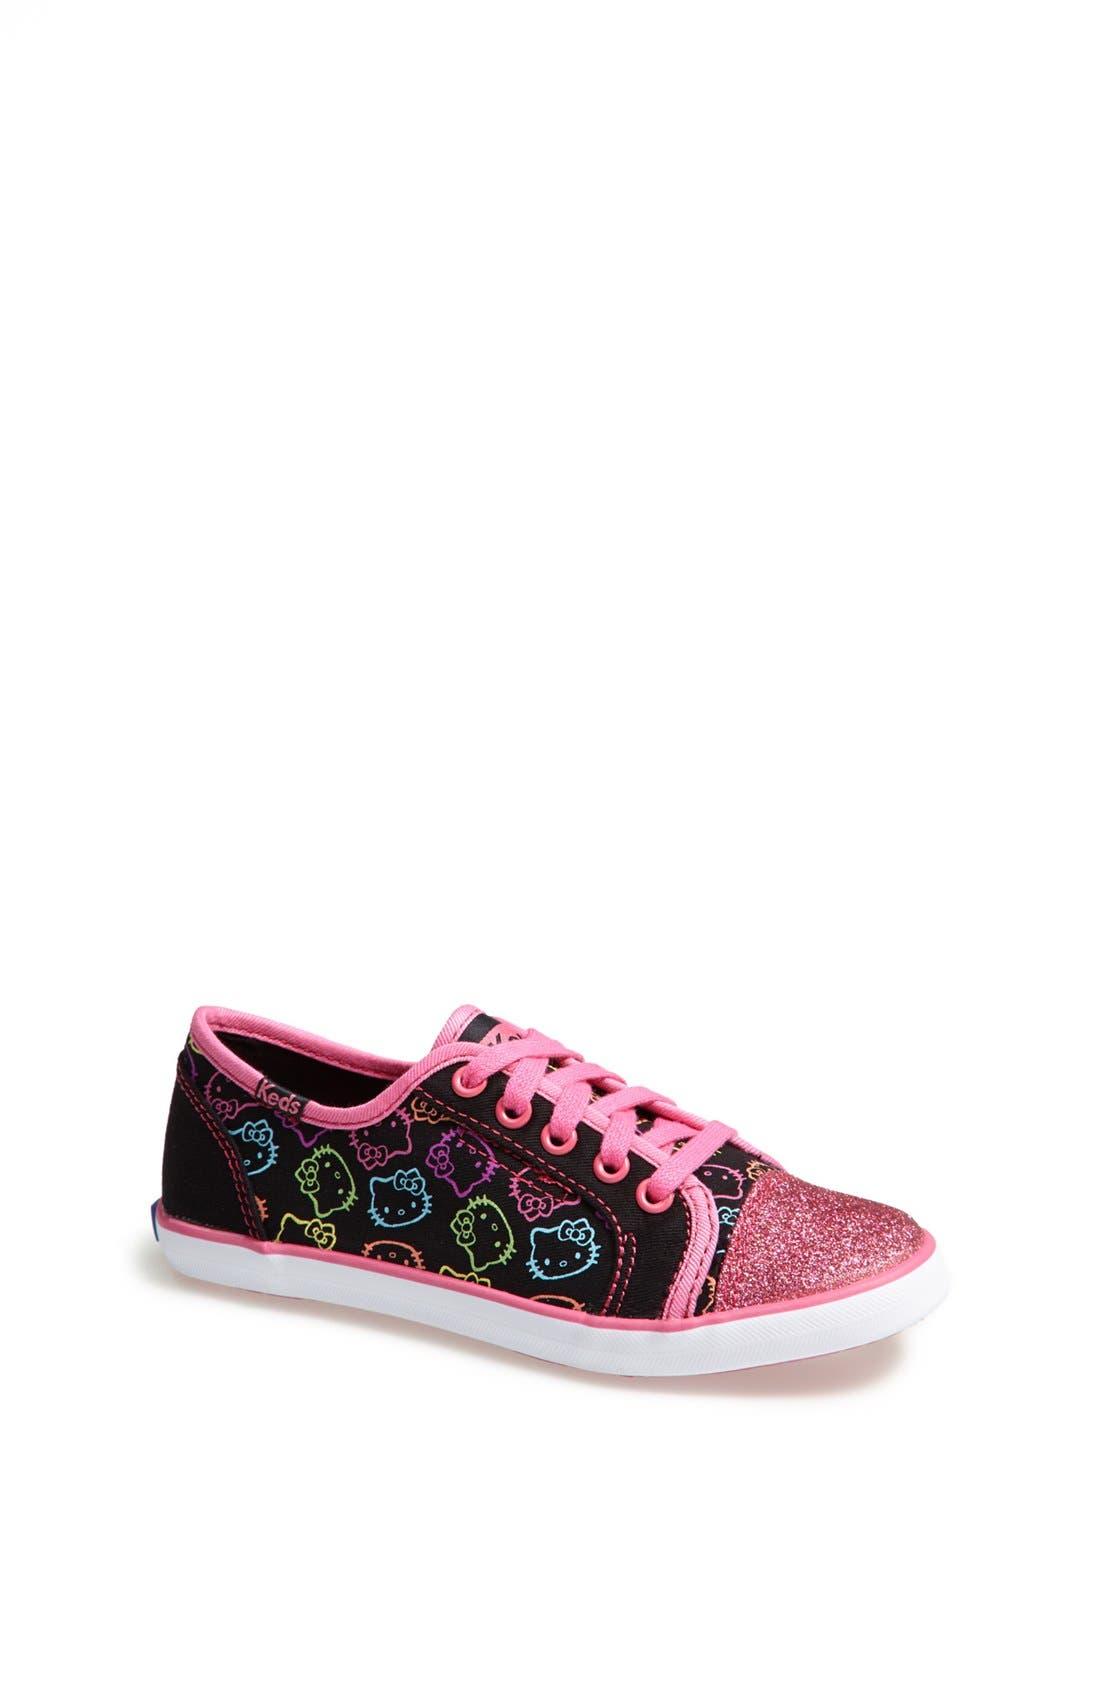 Main Image - Keds 'Hello Kitty® - Rally' Sneaker (Toddler, Little Kid & Big Kid)